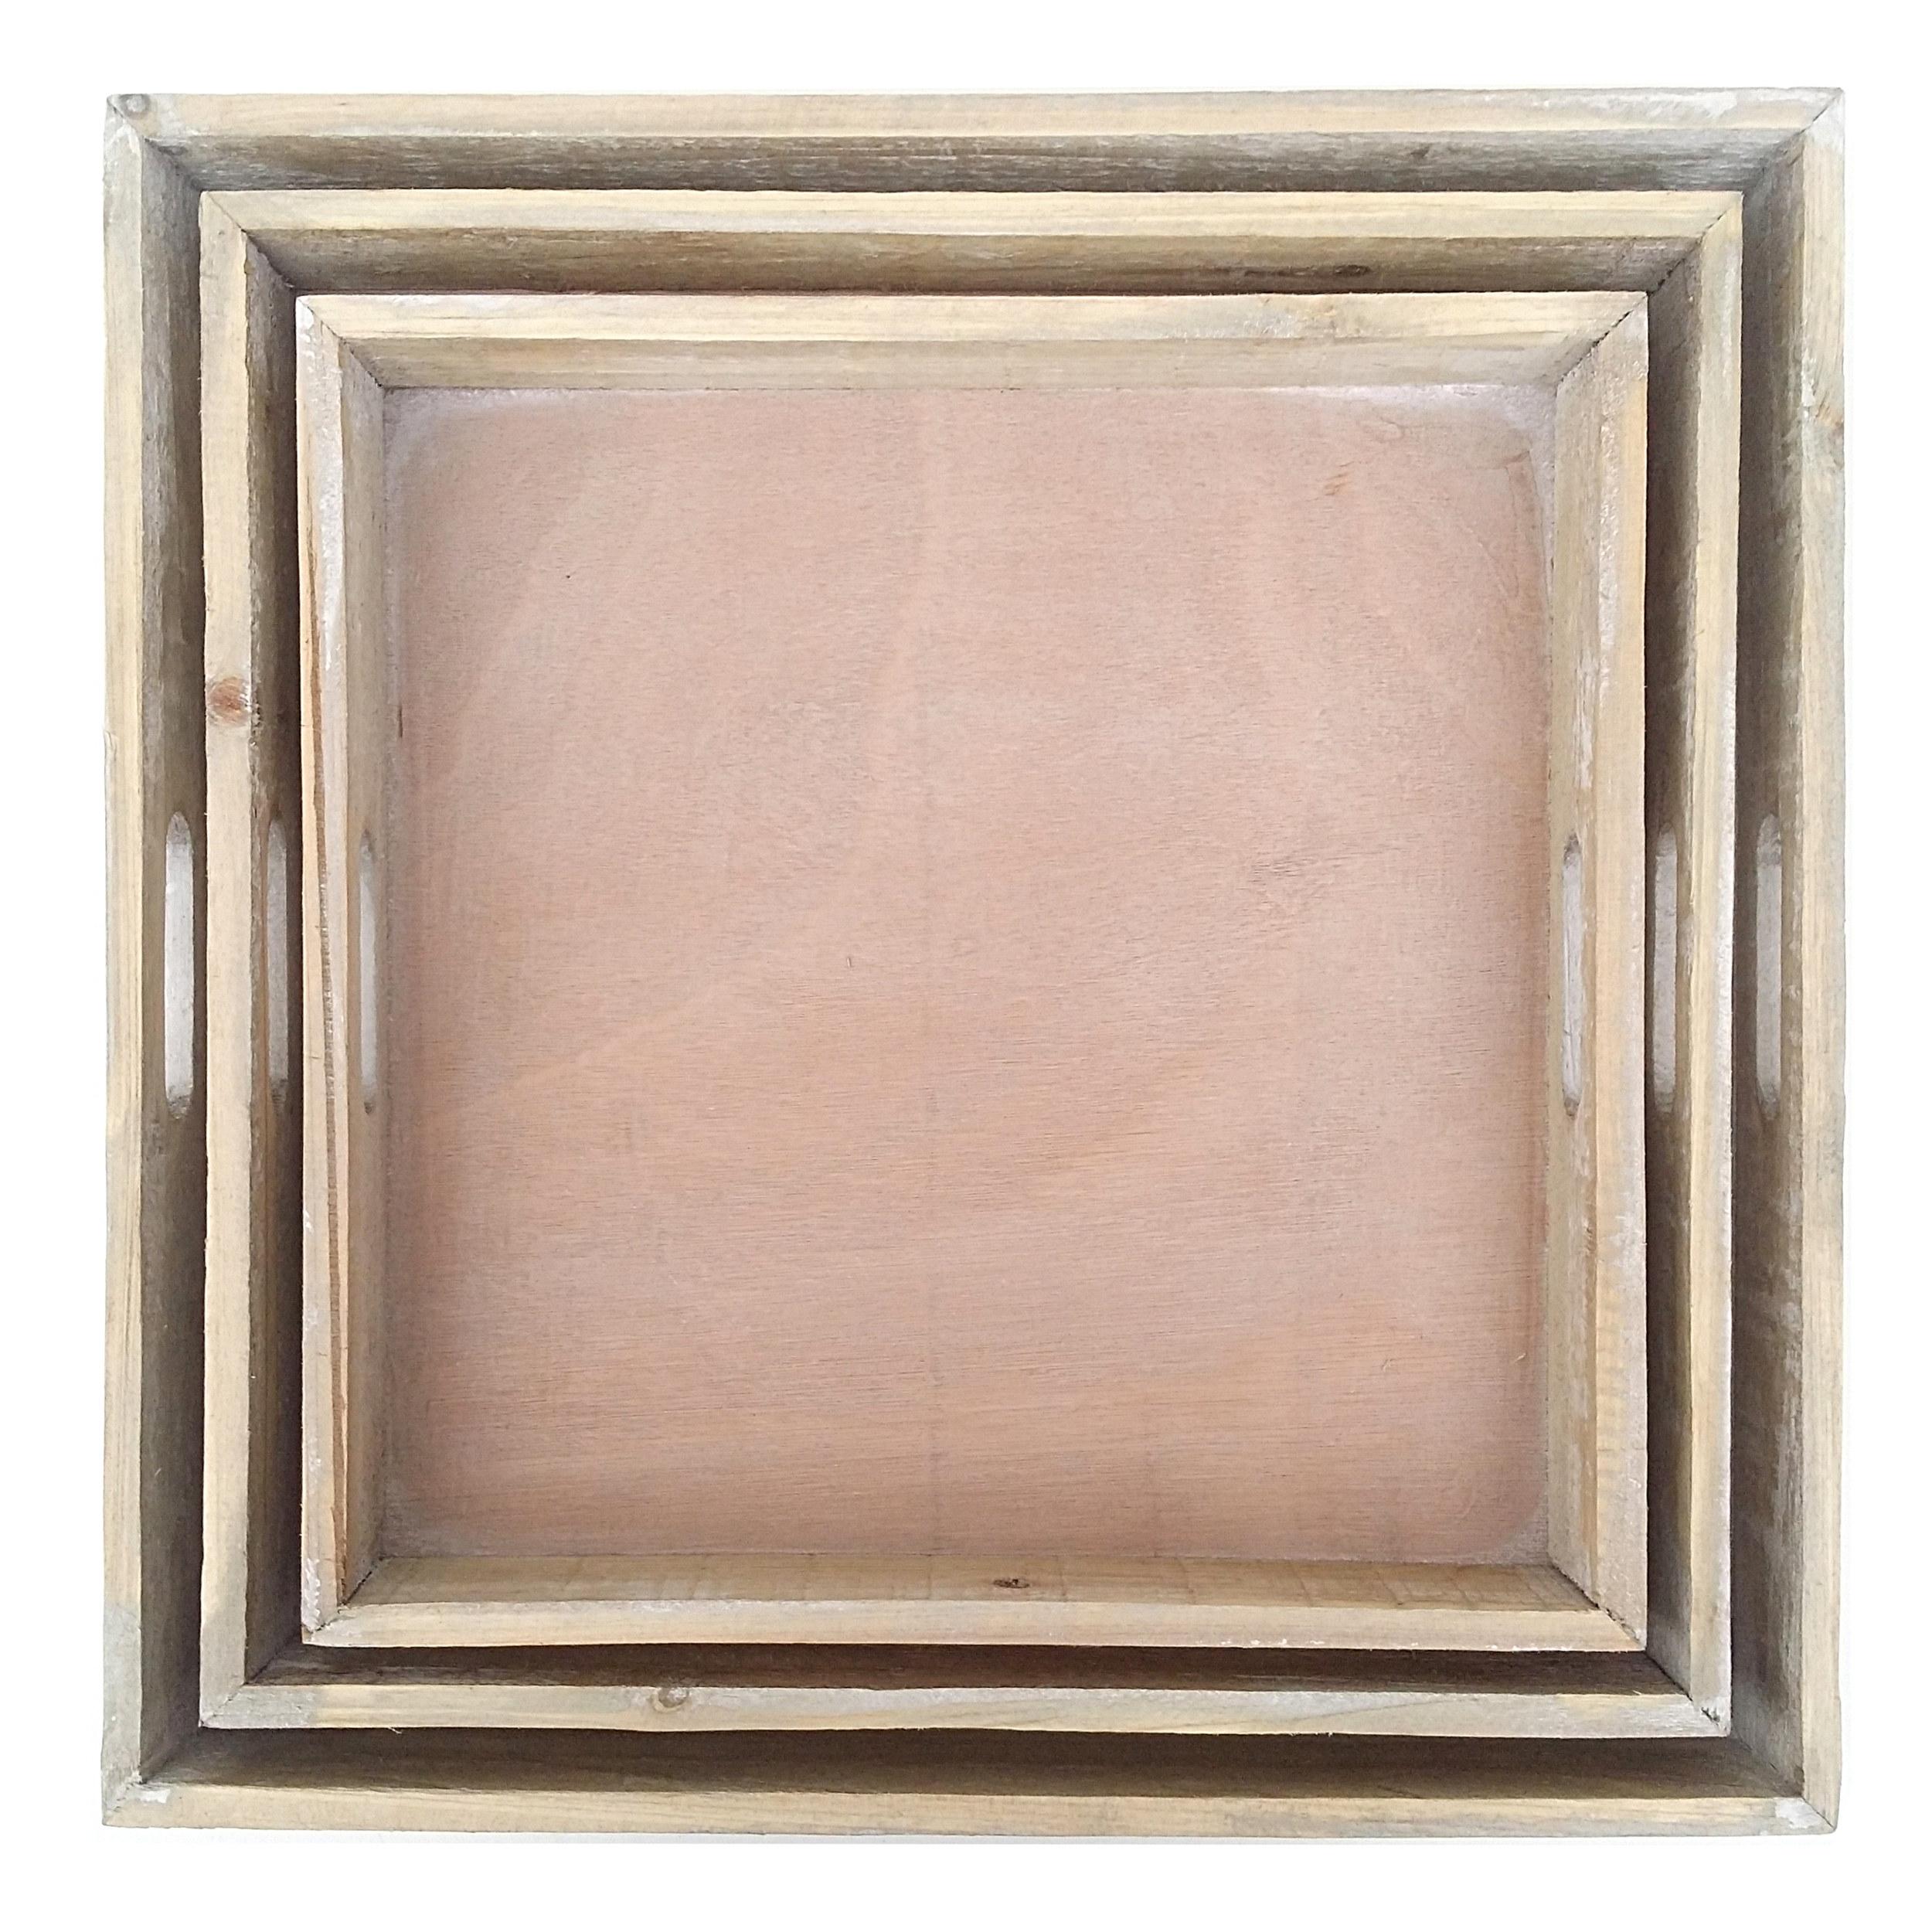 3er tablett set holz gek lkt gross quadratisch kerzentablett dekotablett neu ebay. Black Bedroom Furniture Sets. Home Design Ideas